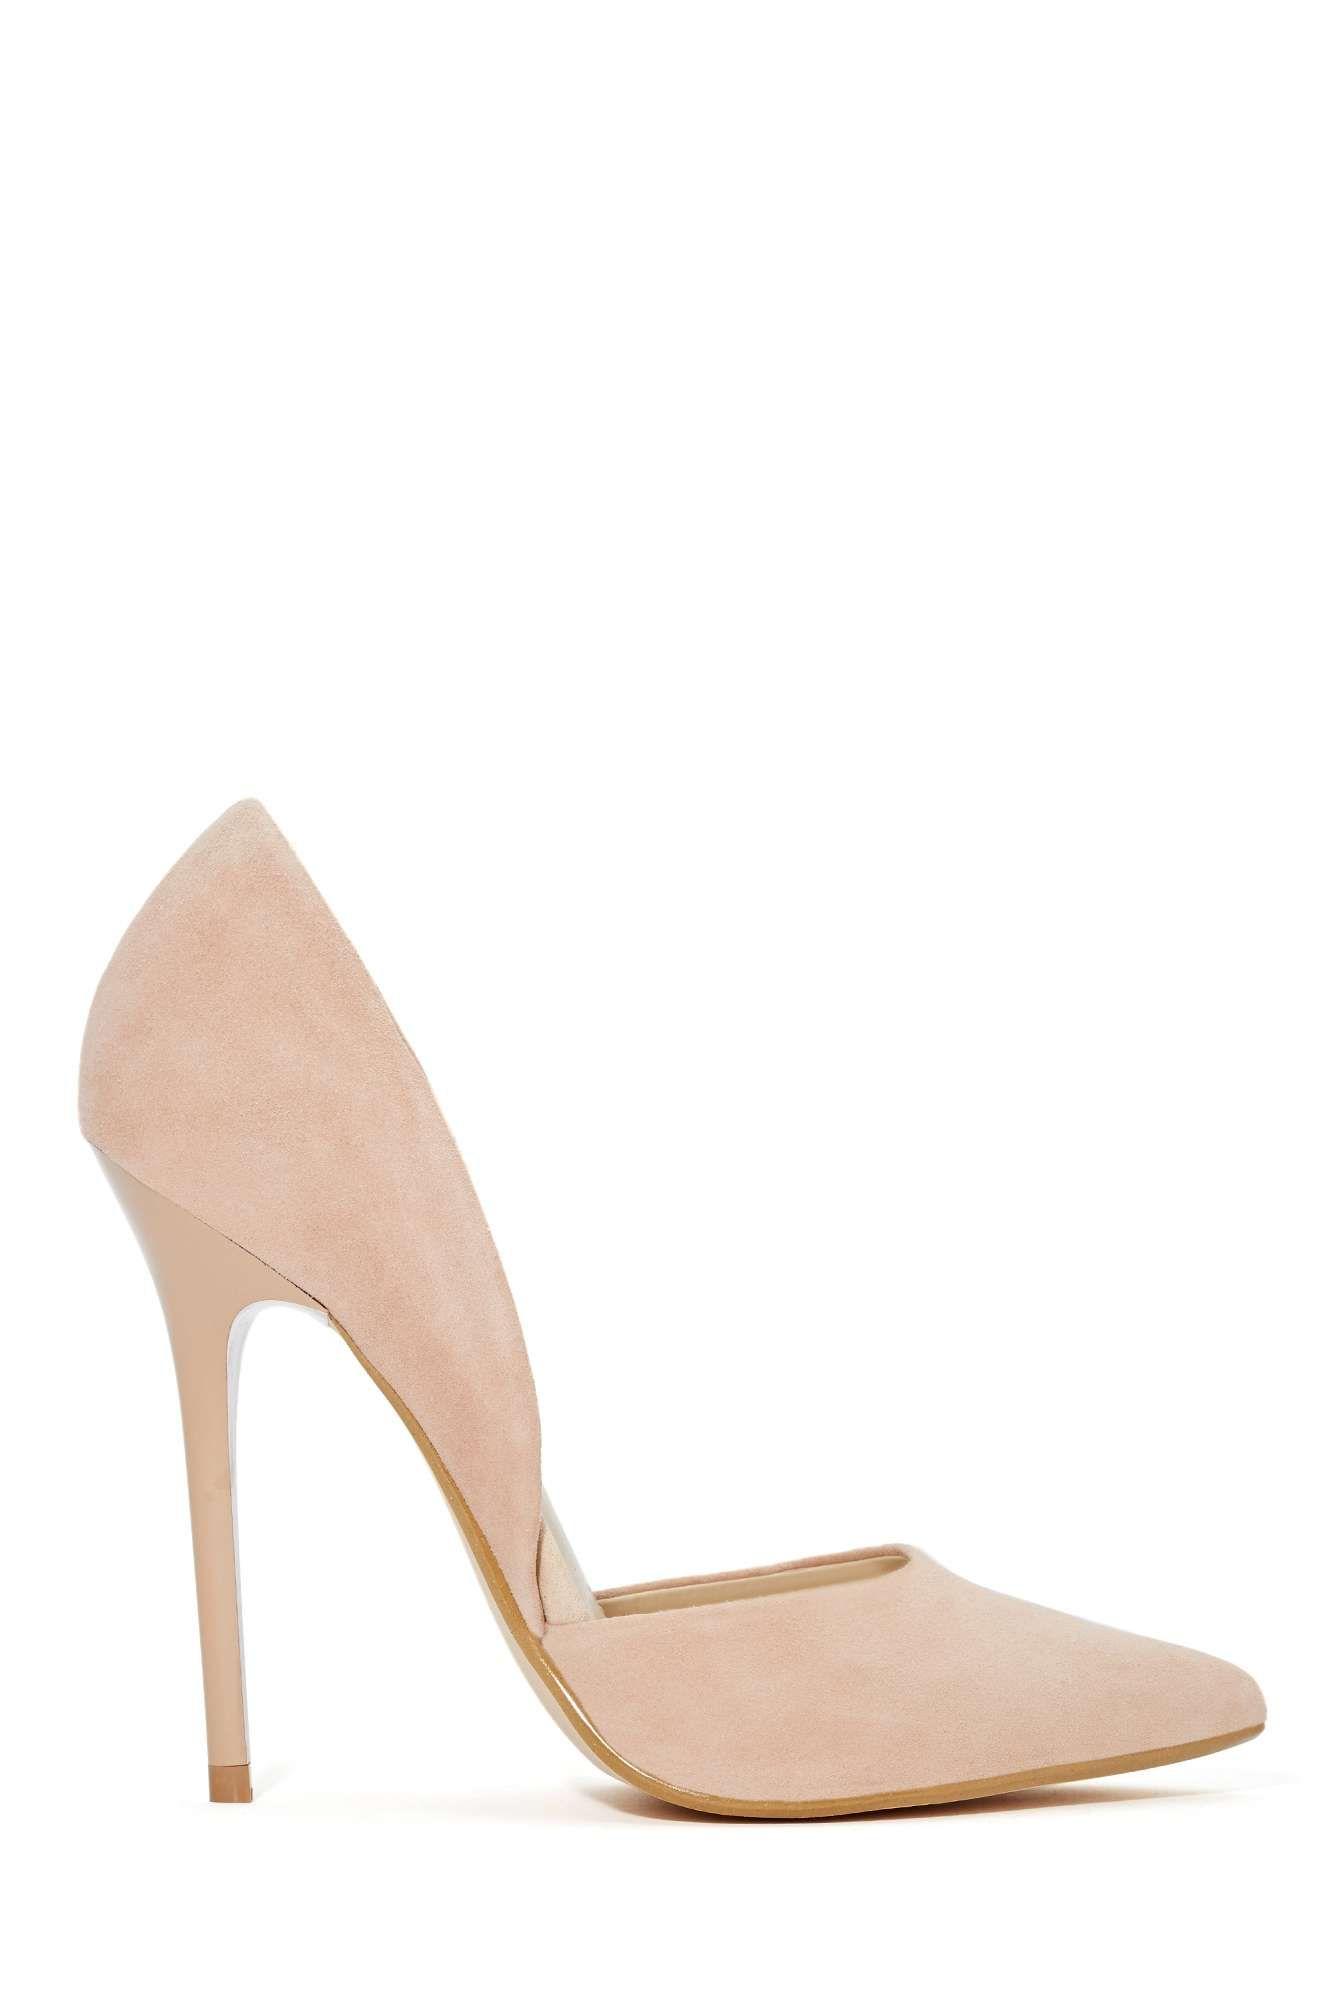 d1f07f77acd steven madden varcity pump. | Let's Get Some Shoes | Shoe boots ...